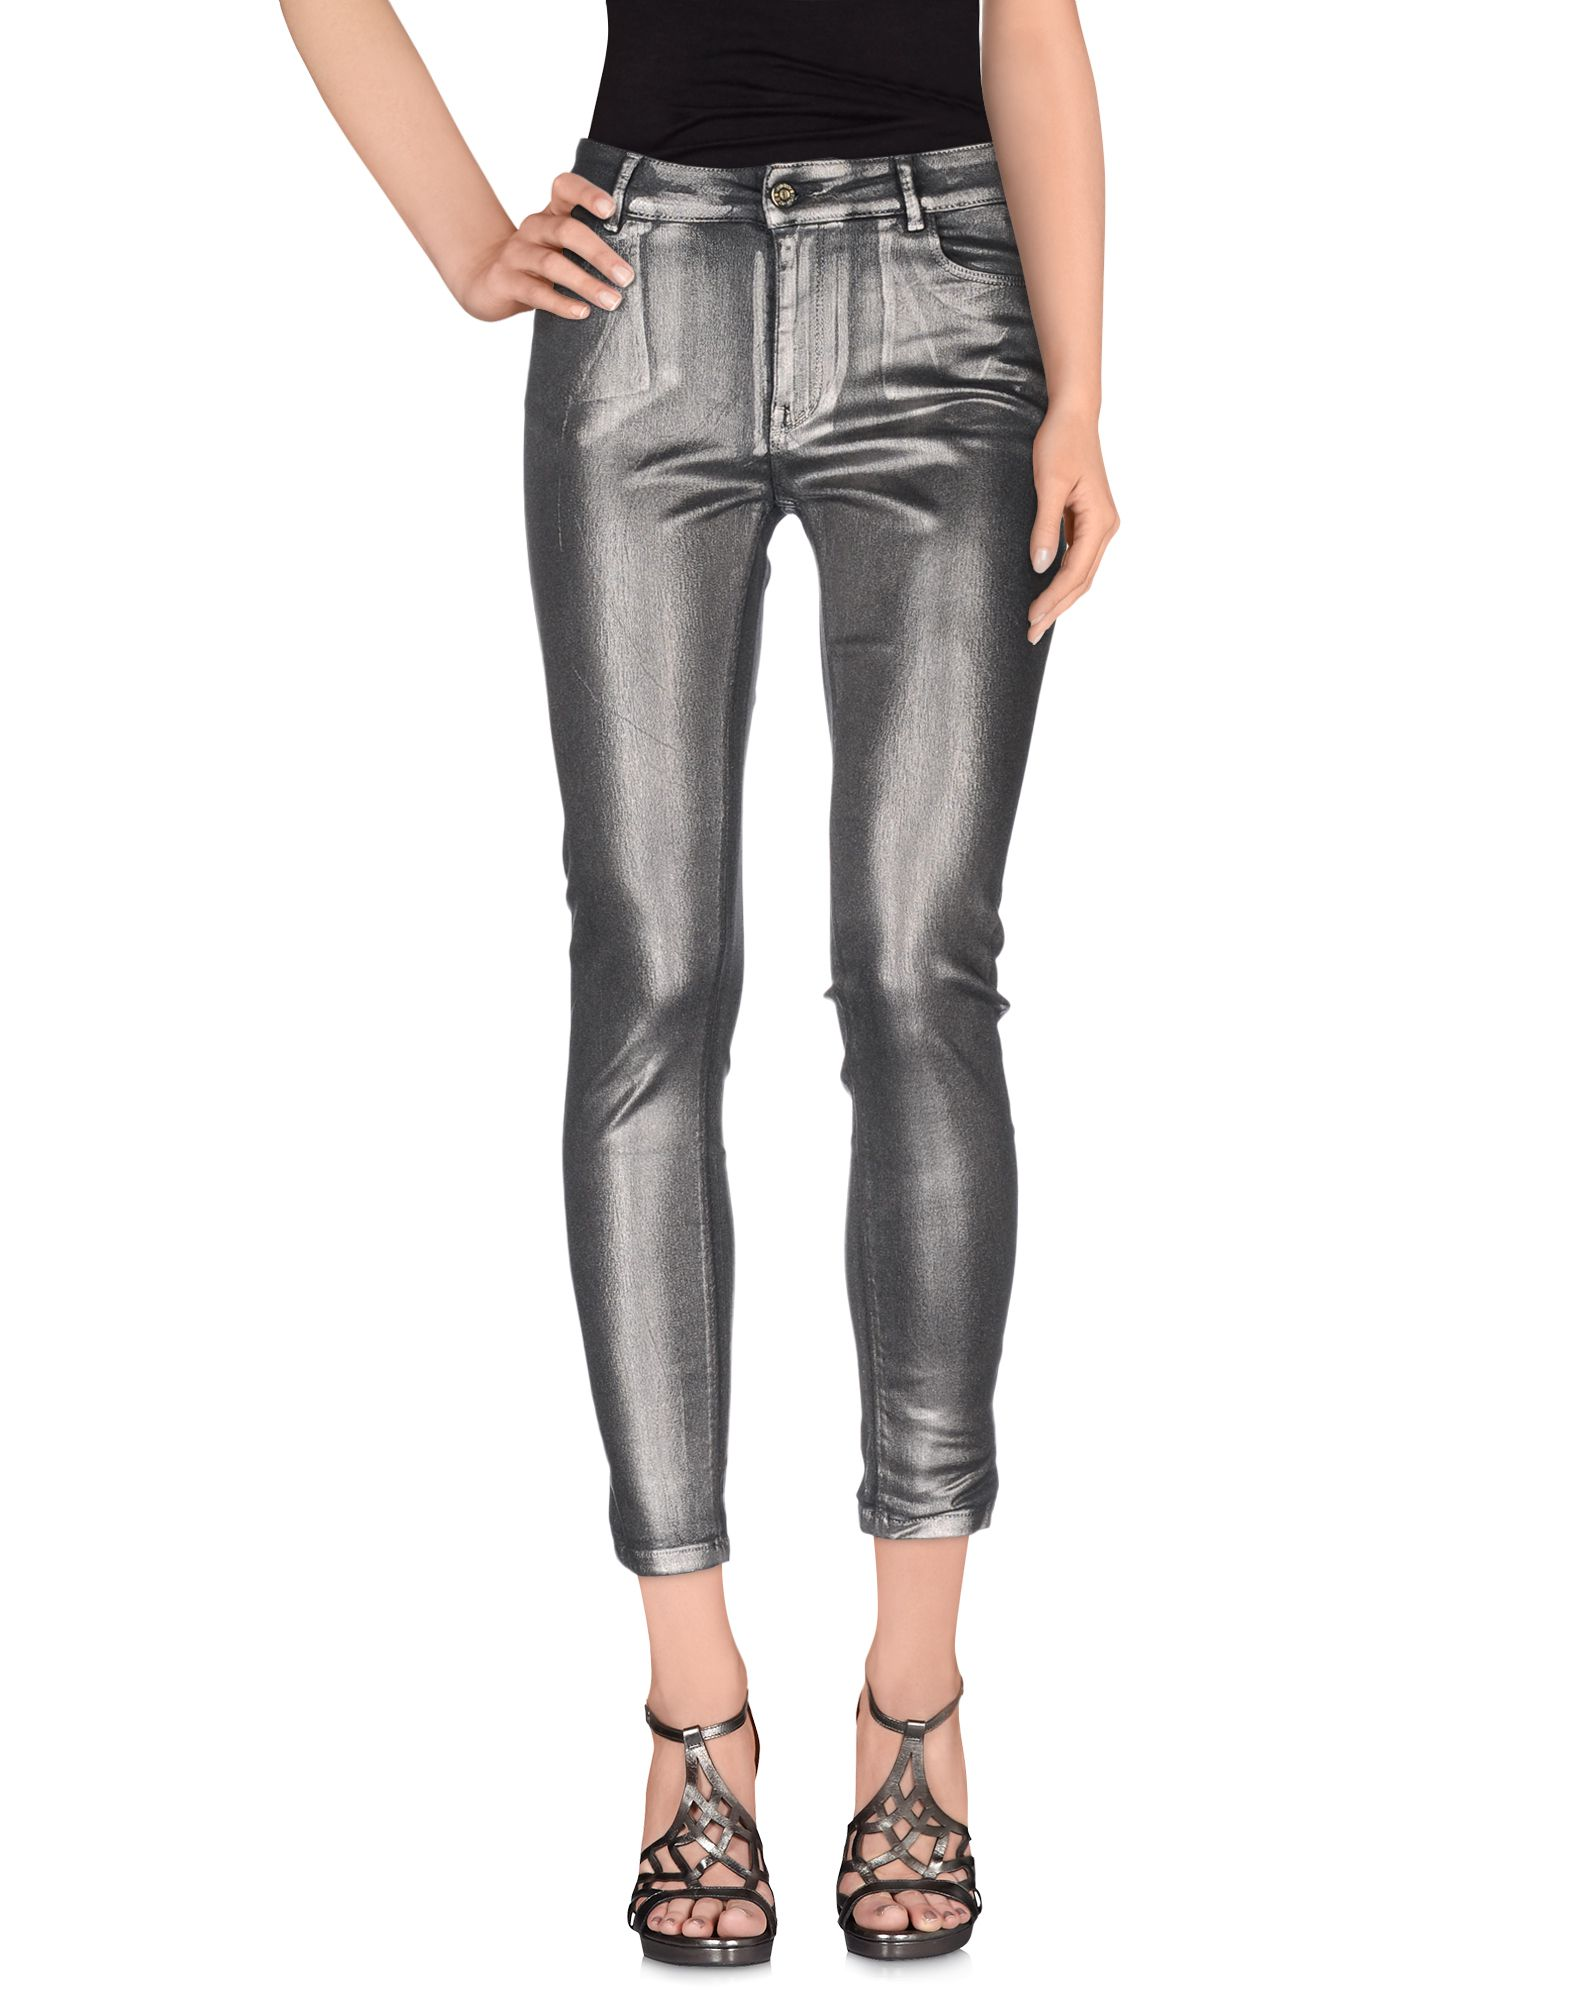 ATOS LOMBARDINI Damen Jeanshose Farbe Silber Größe 3